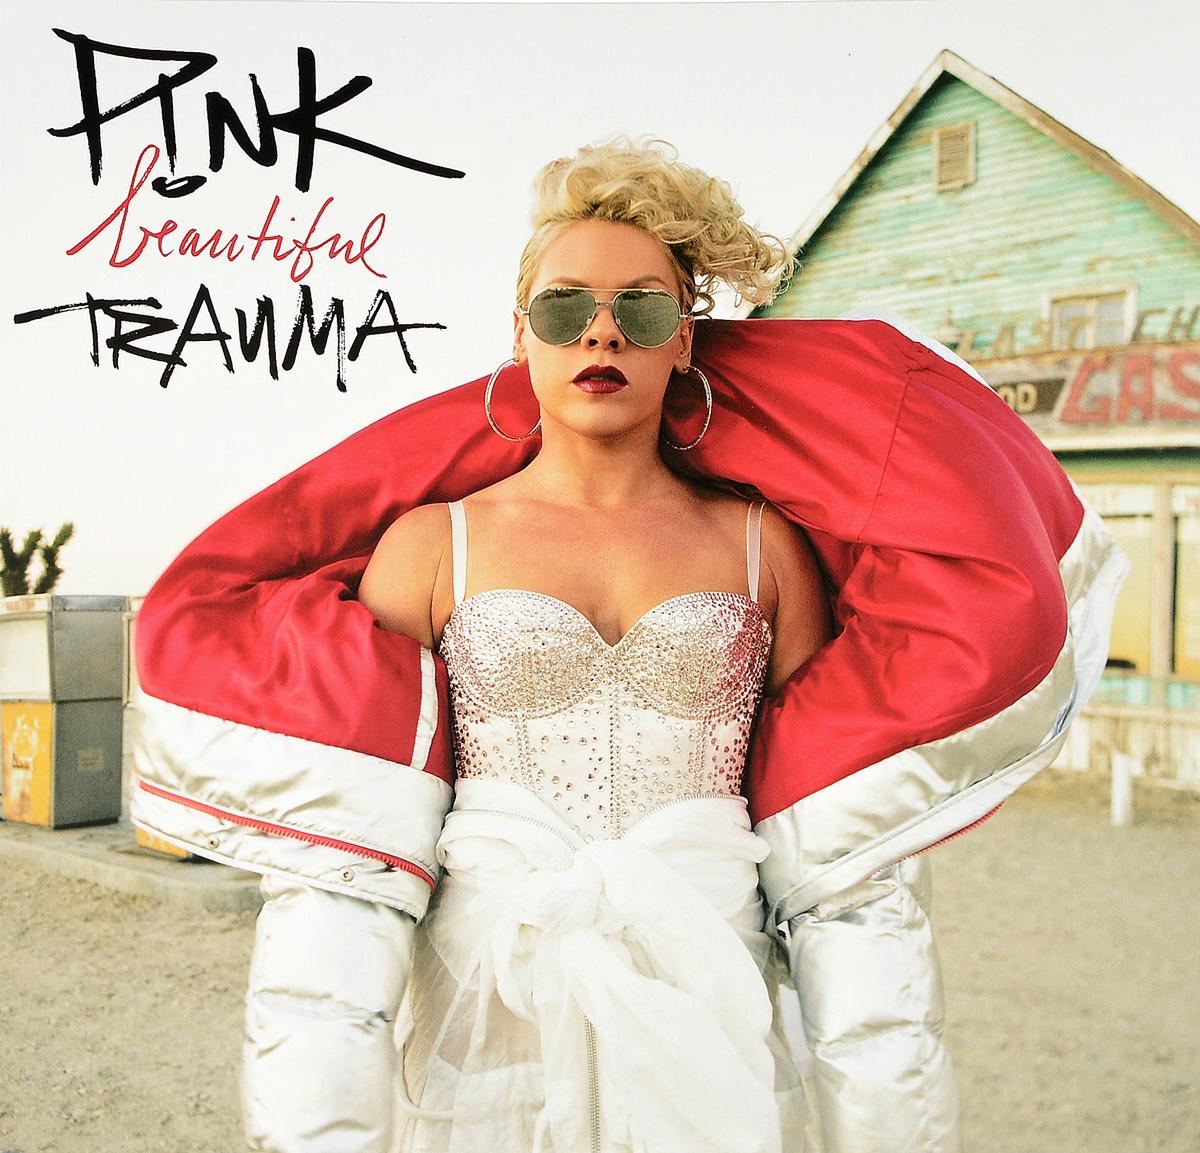 Фото - Pink Pink. Beautiful Trauma (2 LP) women handbags 2018 new fashion summer chain ladies hand bags cartoon girl printed female crossbody pink casual tote k059